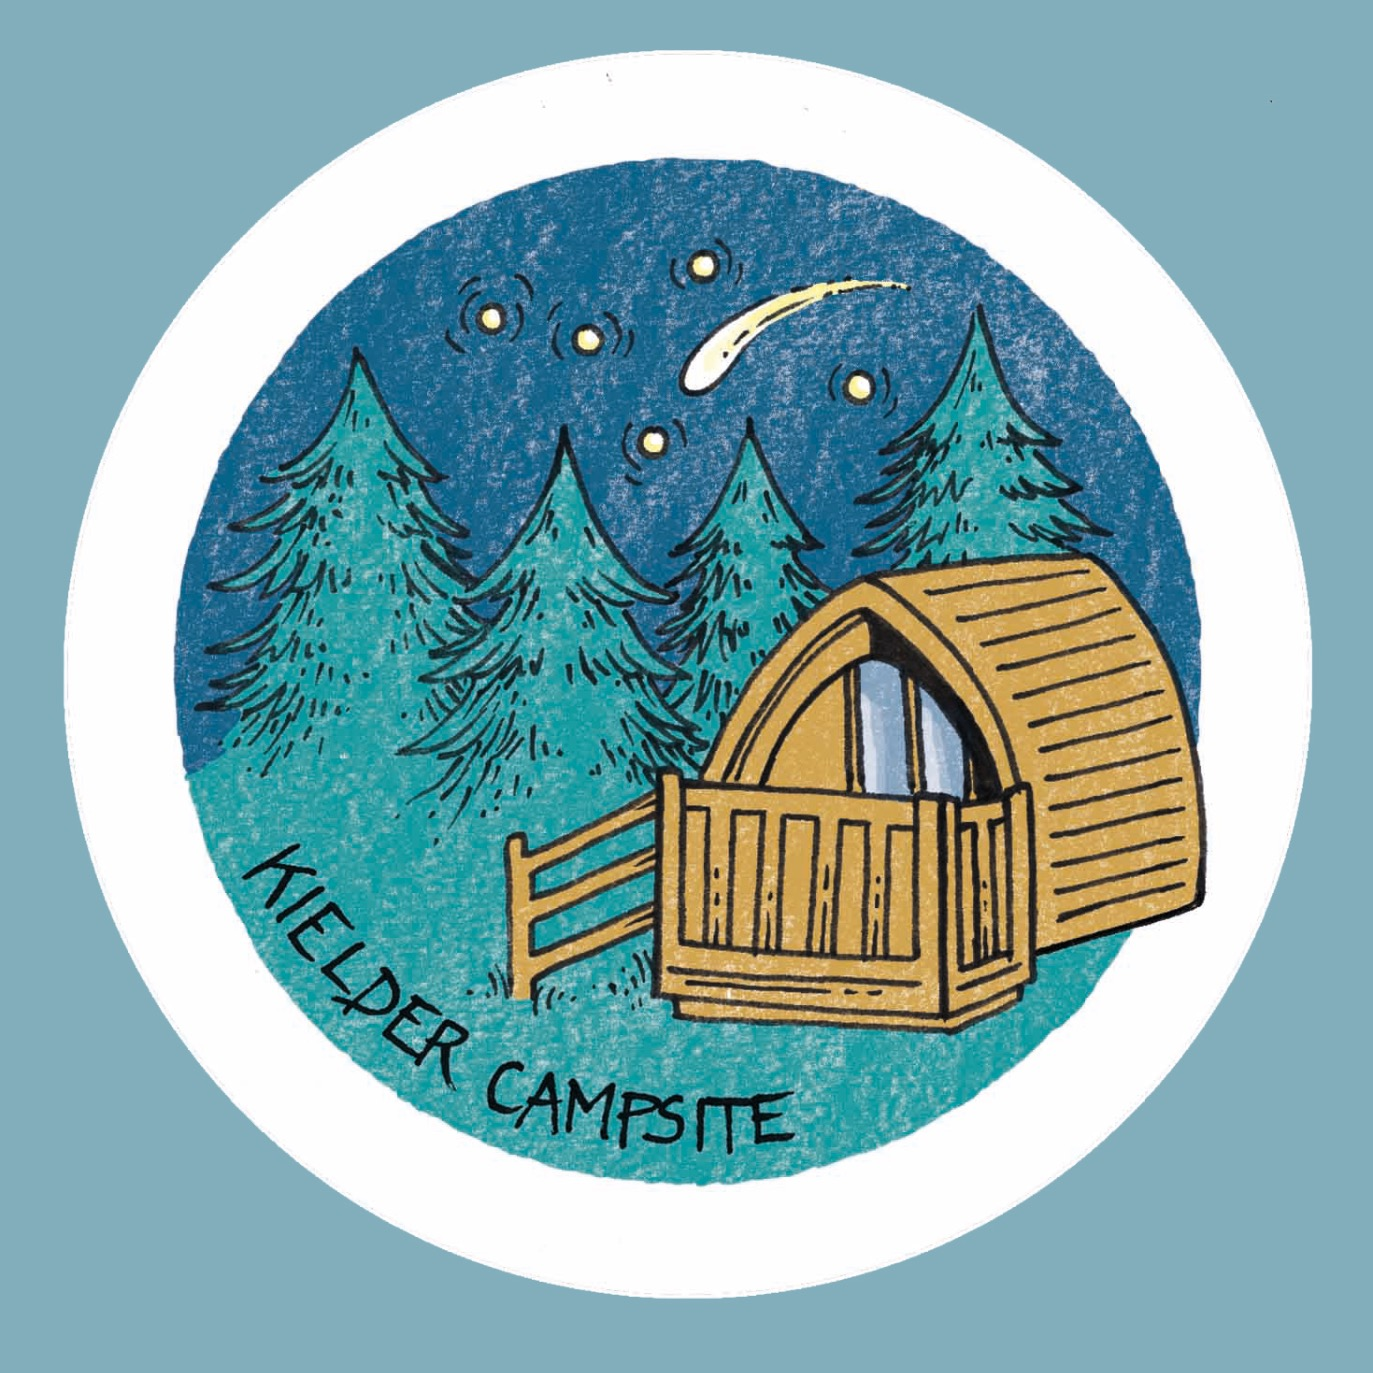 Kielder Campsite stickers